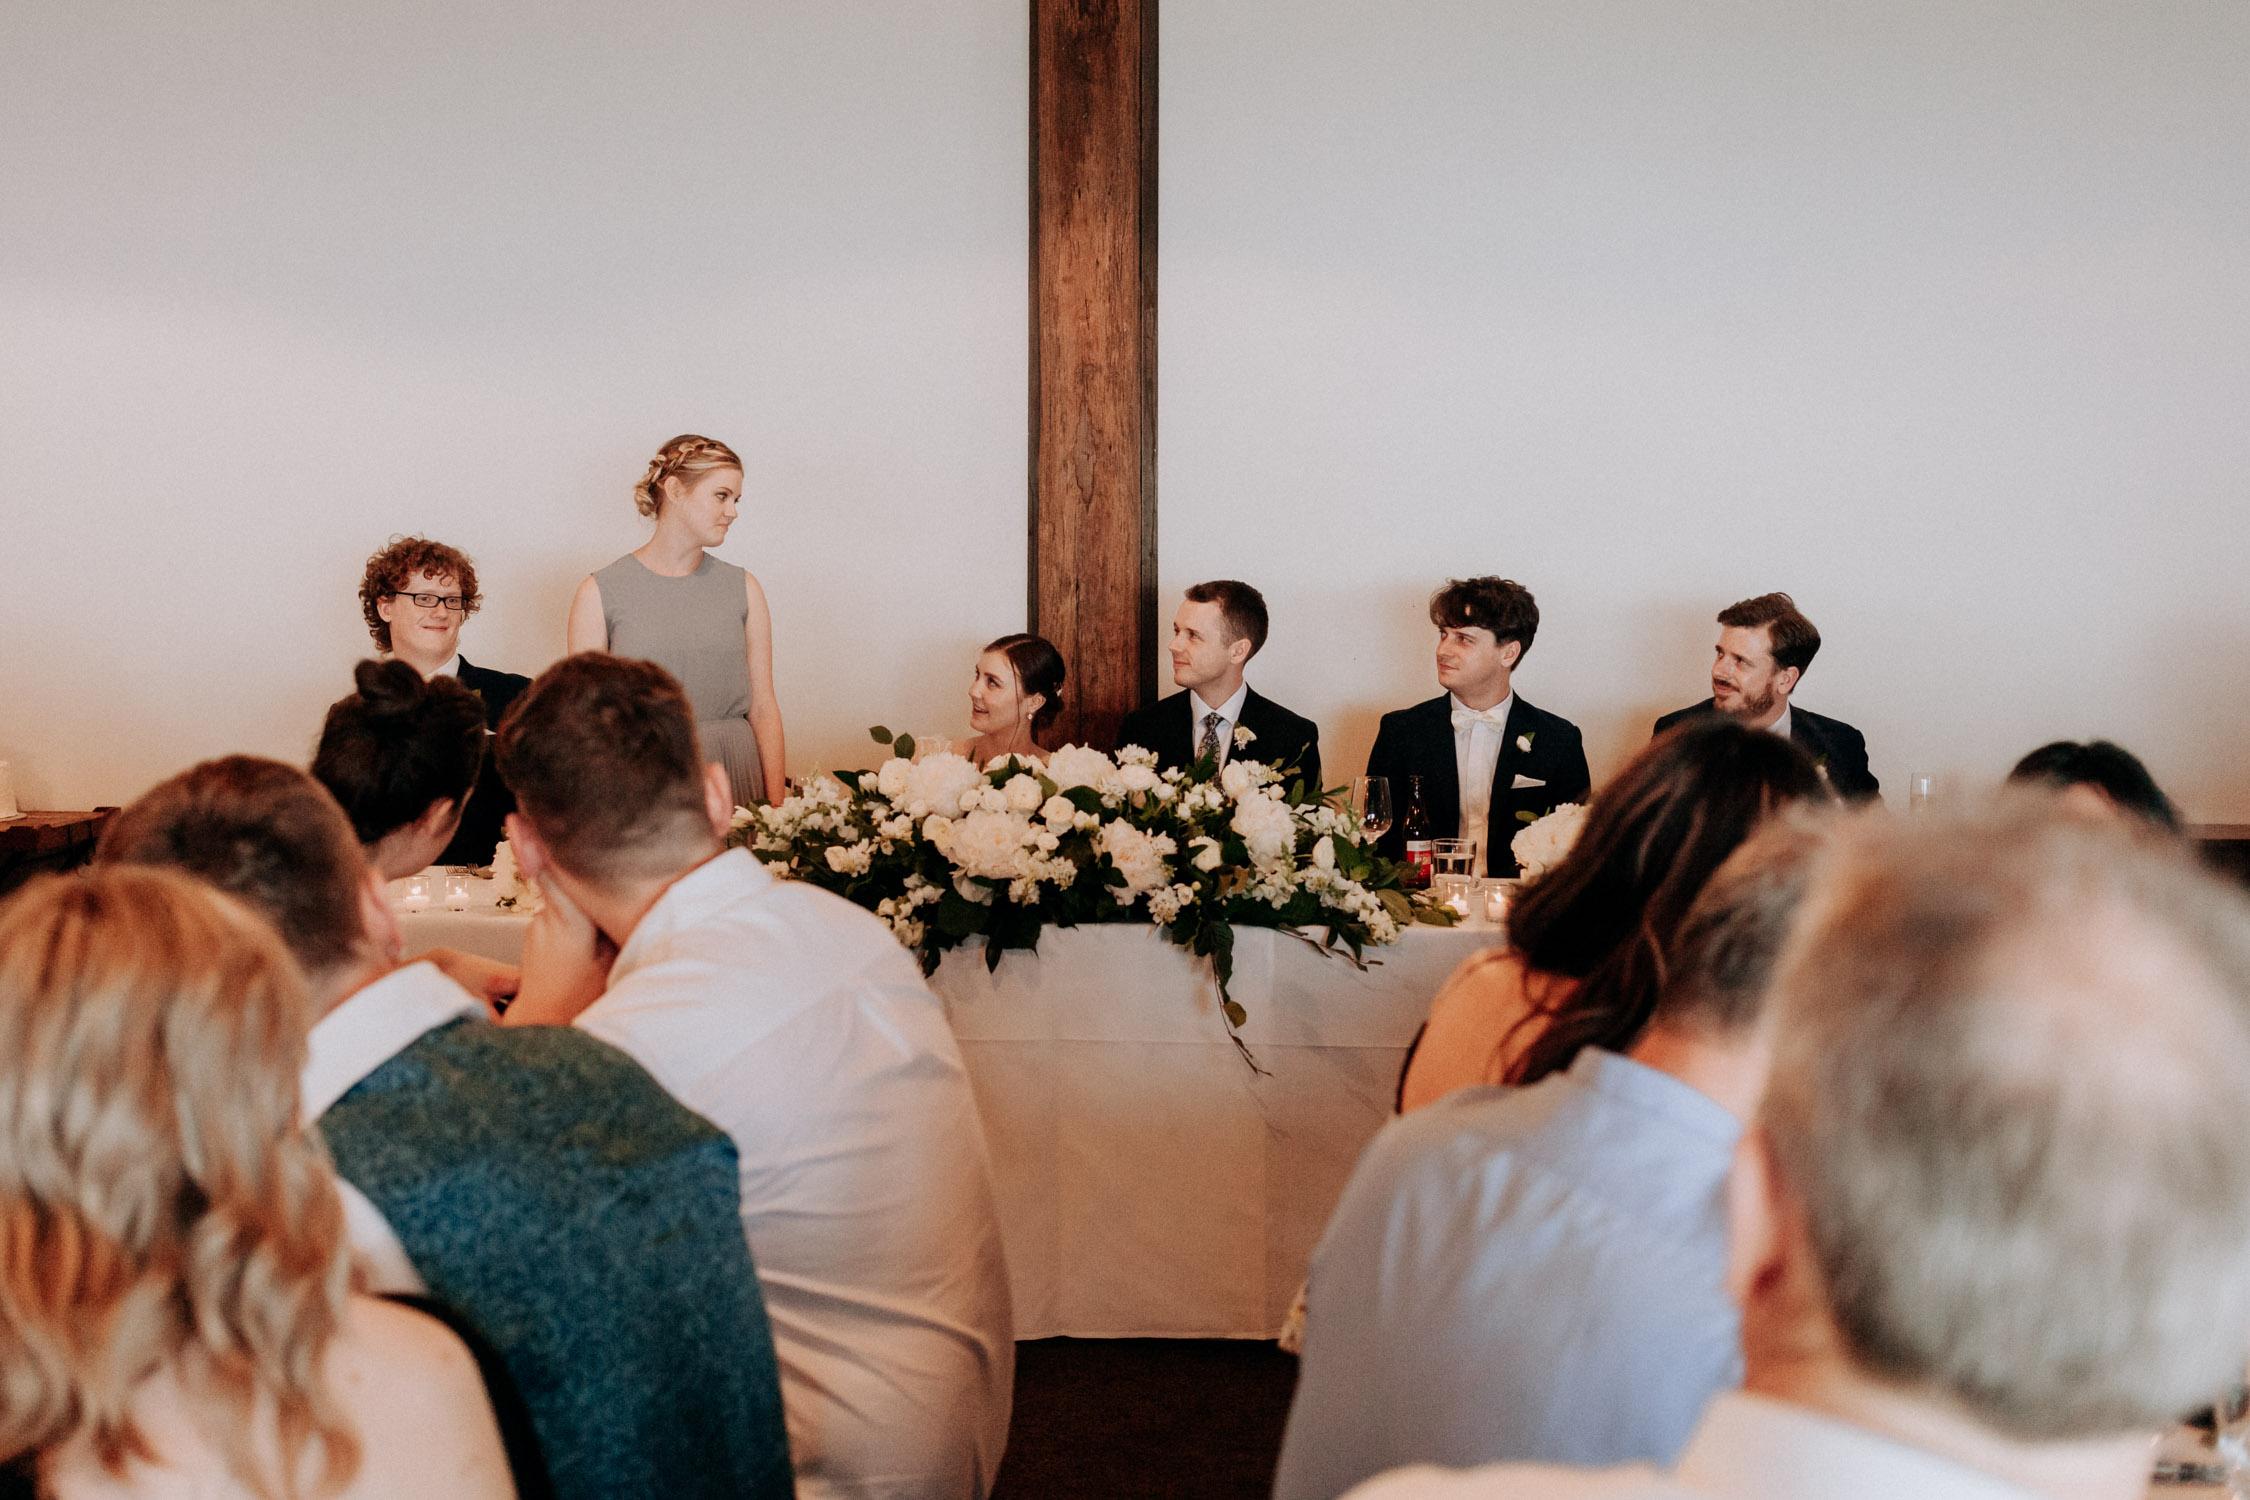 Boomrock wedding reception